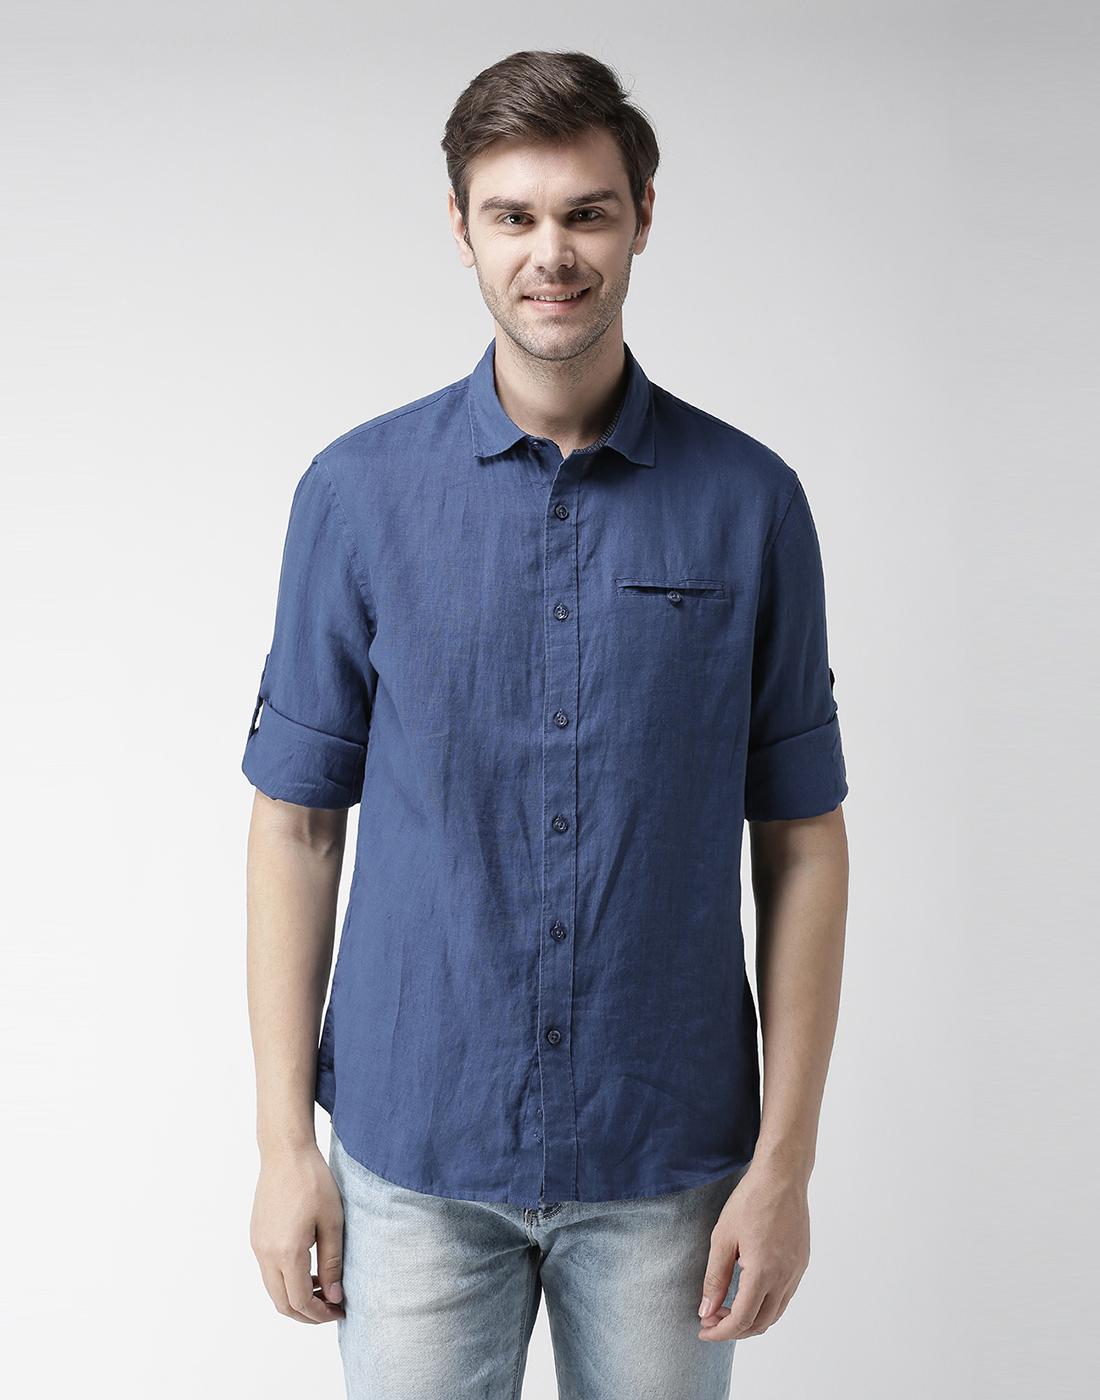 celio |  100% Linen Blue Casual Shirts